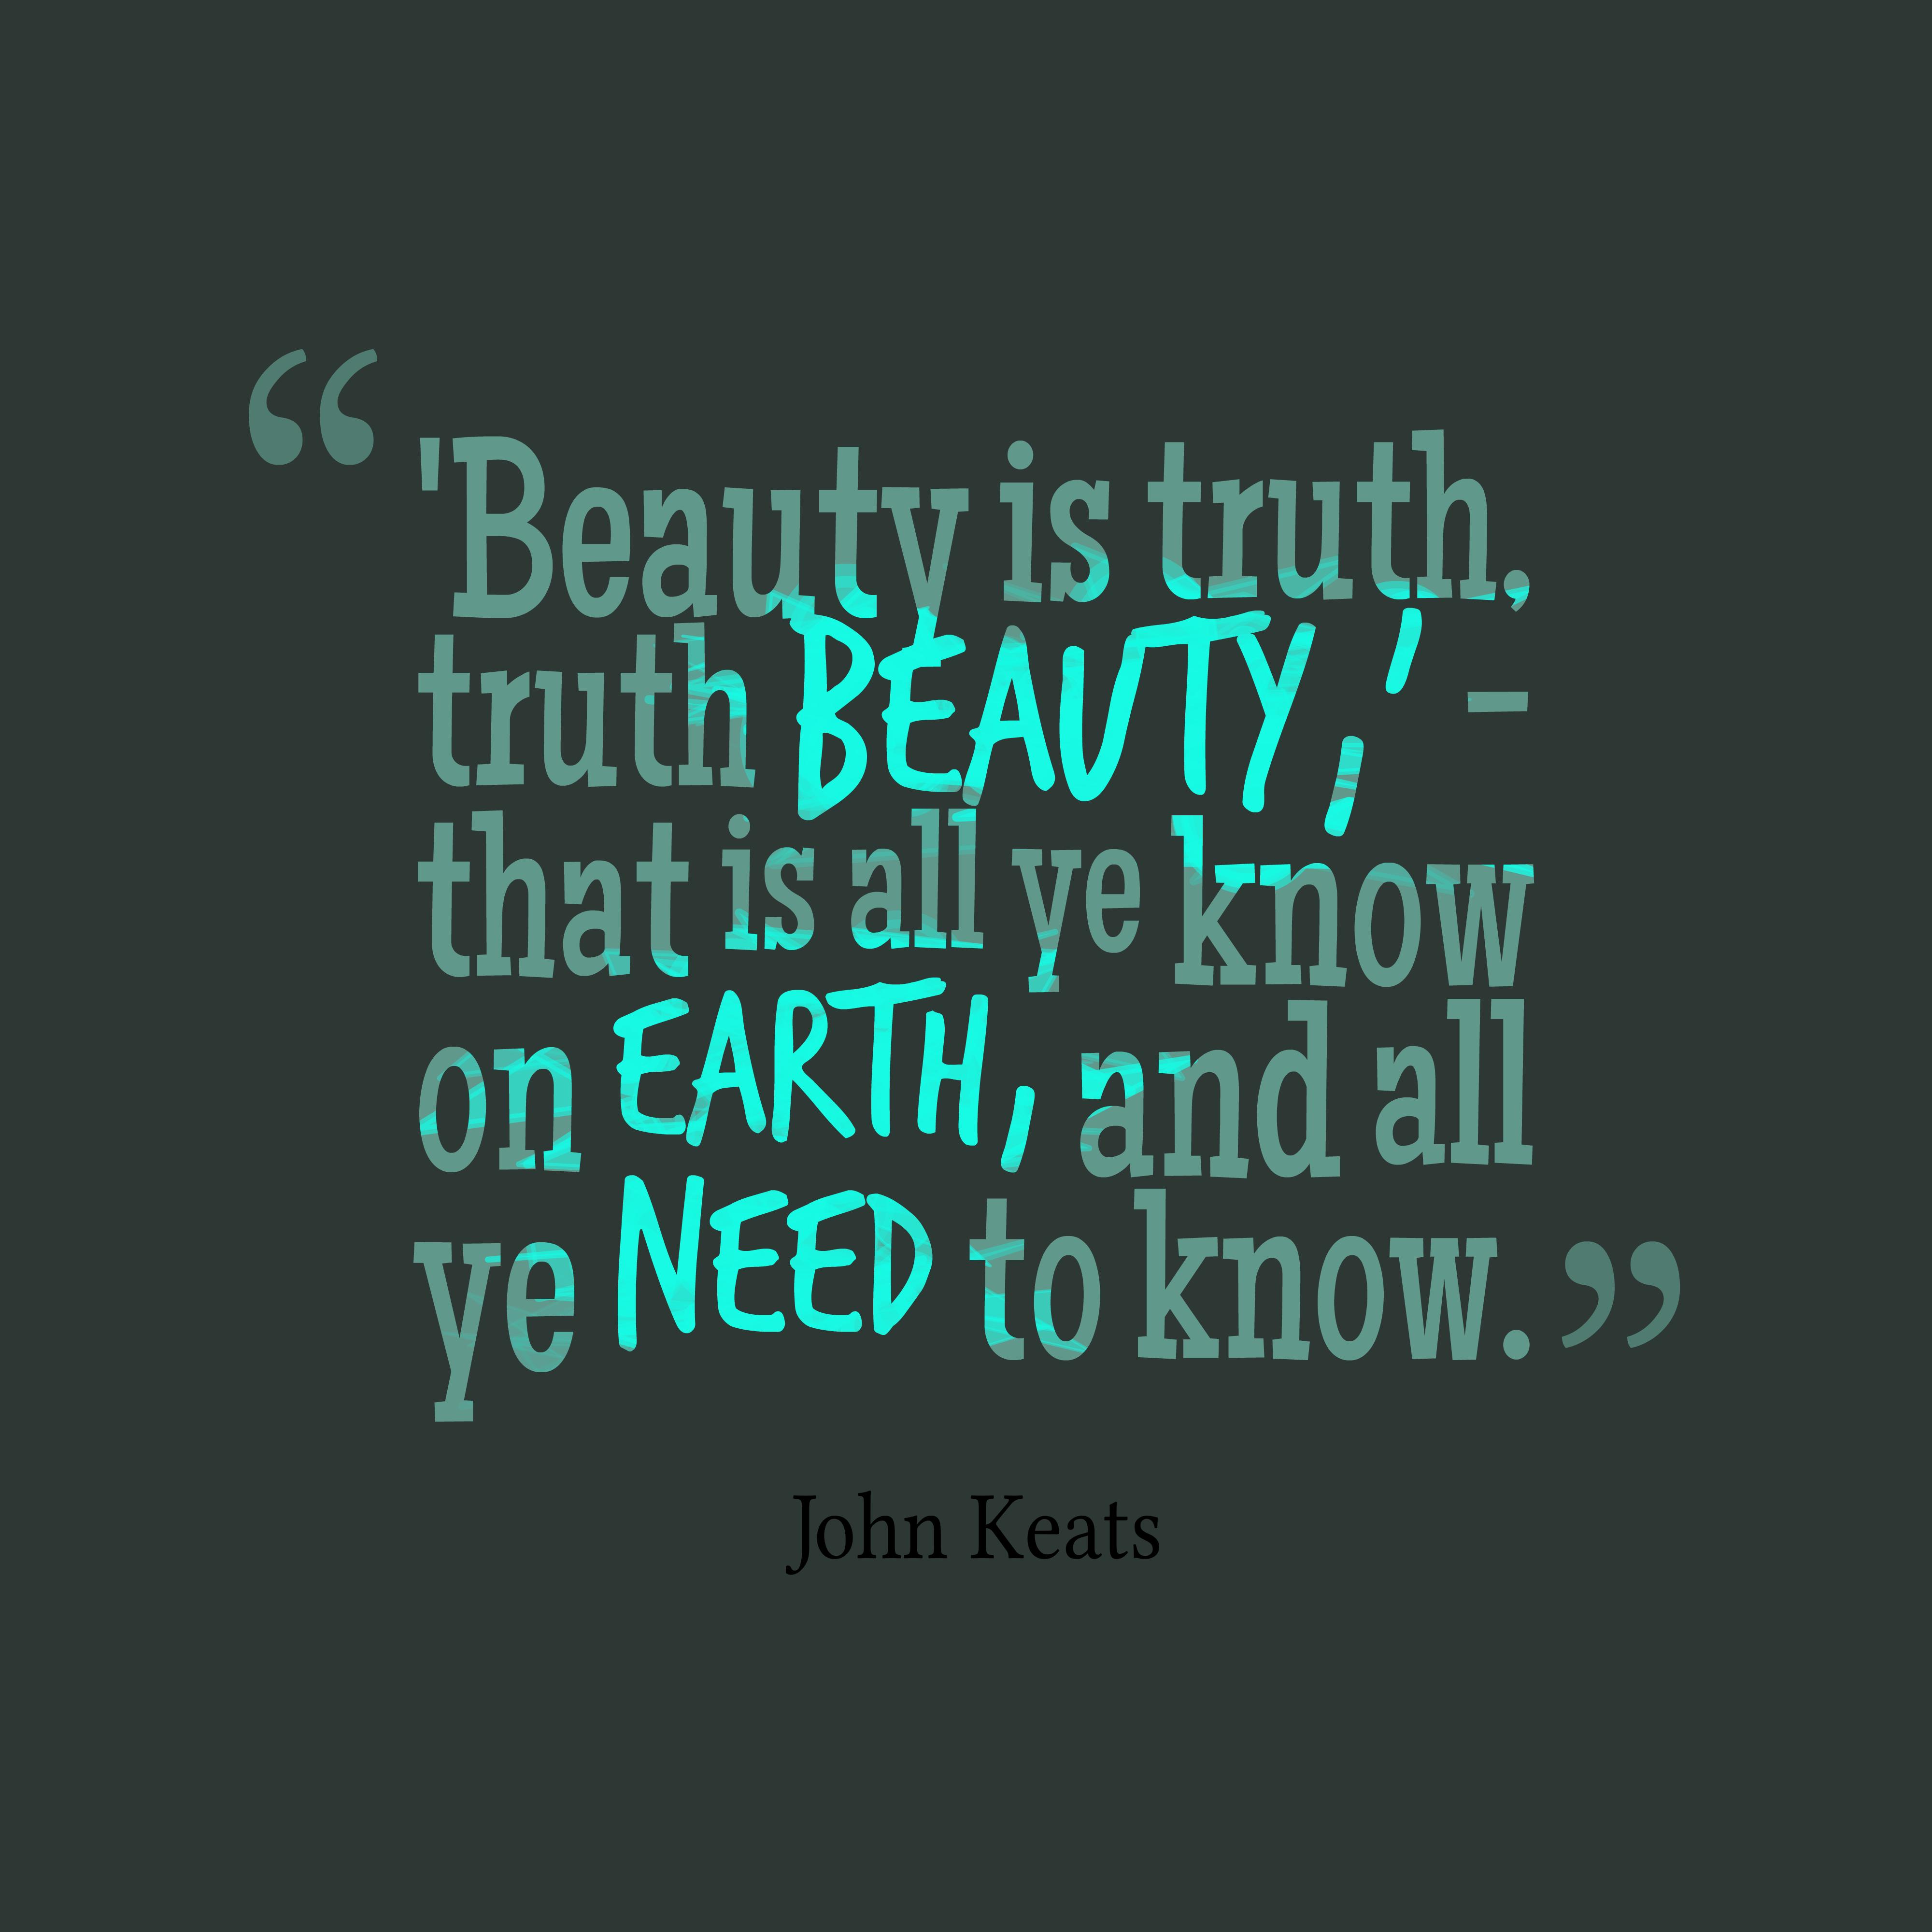 Beauty-is-truth-truth-beauty__quotes-by-John-Keats-13